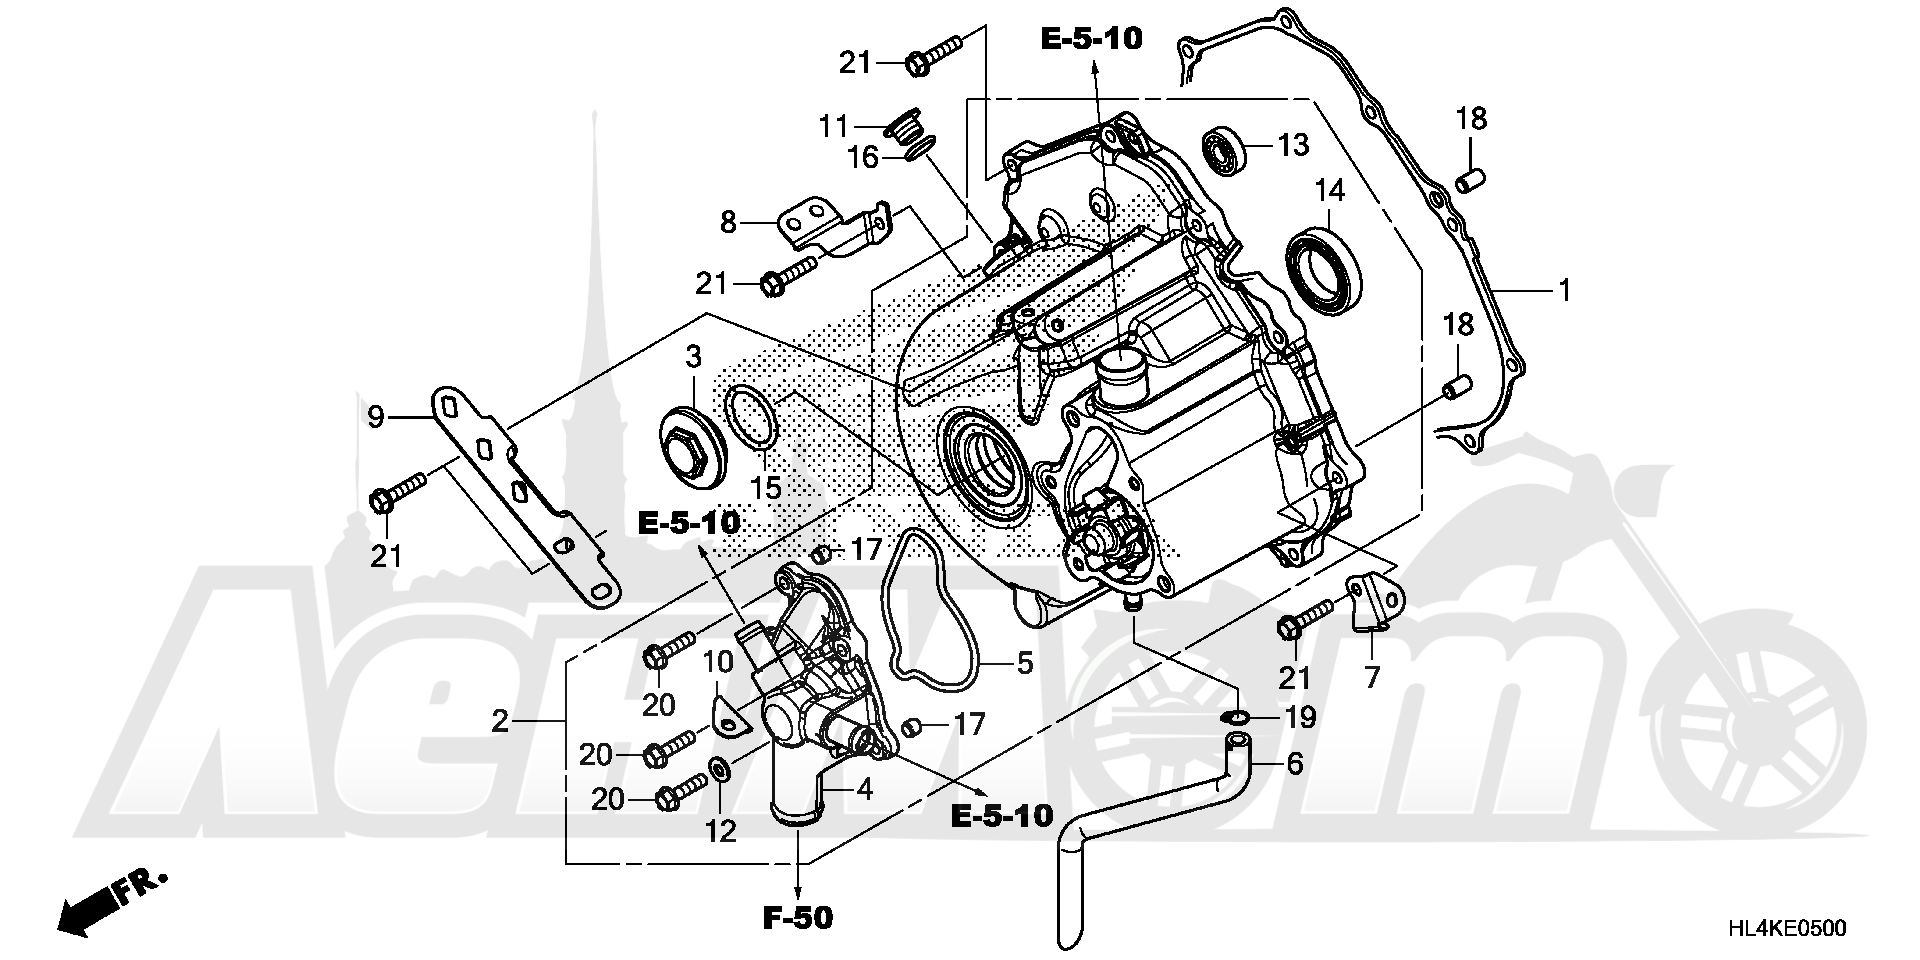 Запчасти для Квадроцикла Honda 2019 SXS1000M5D Раздел: ALTERNATOR COVER | генератор крышка